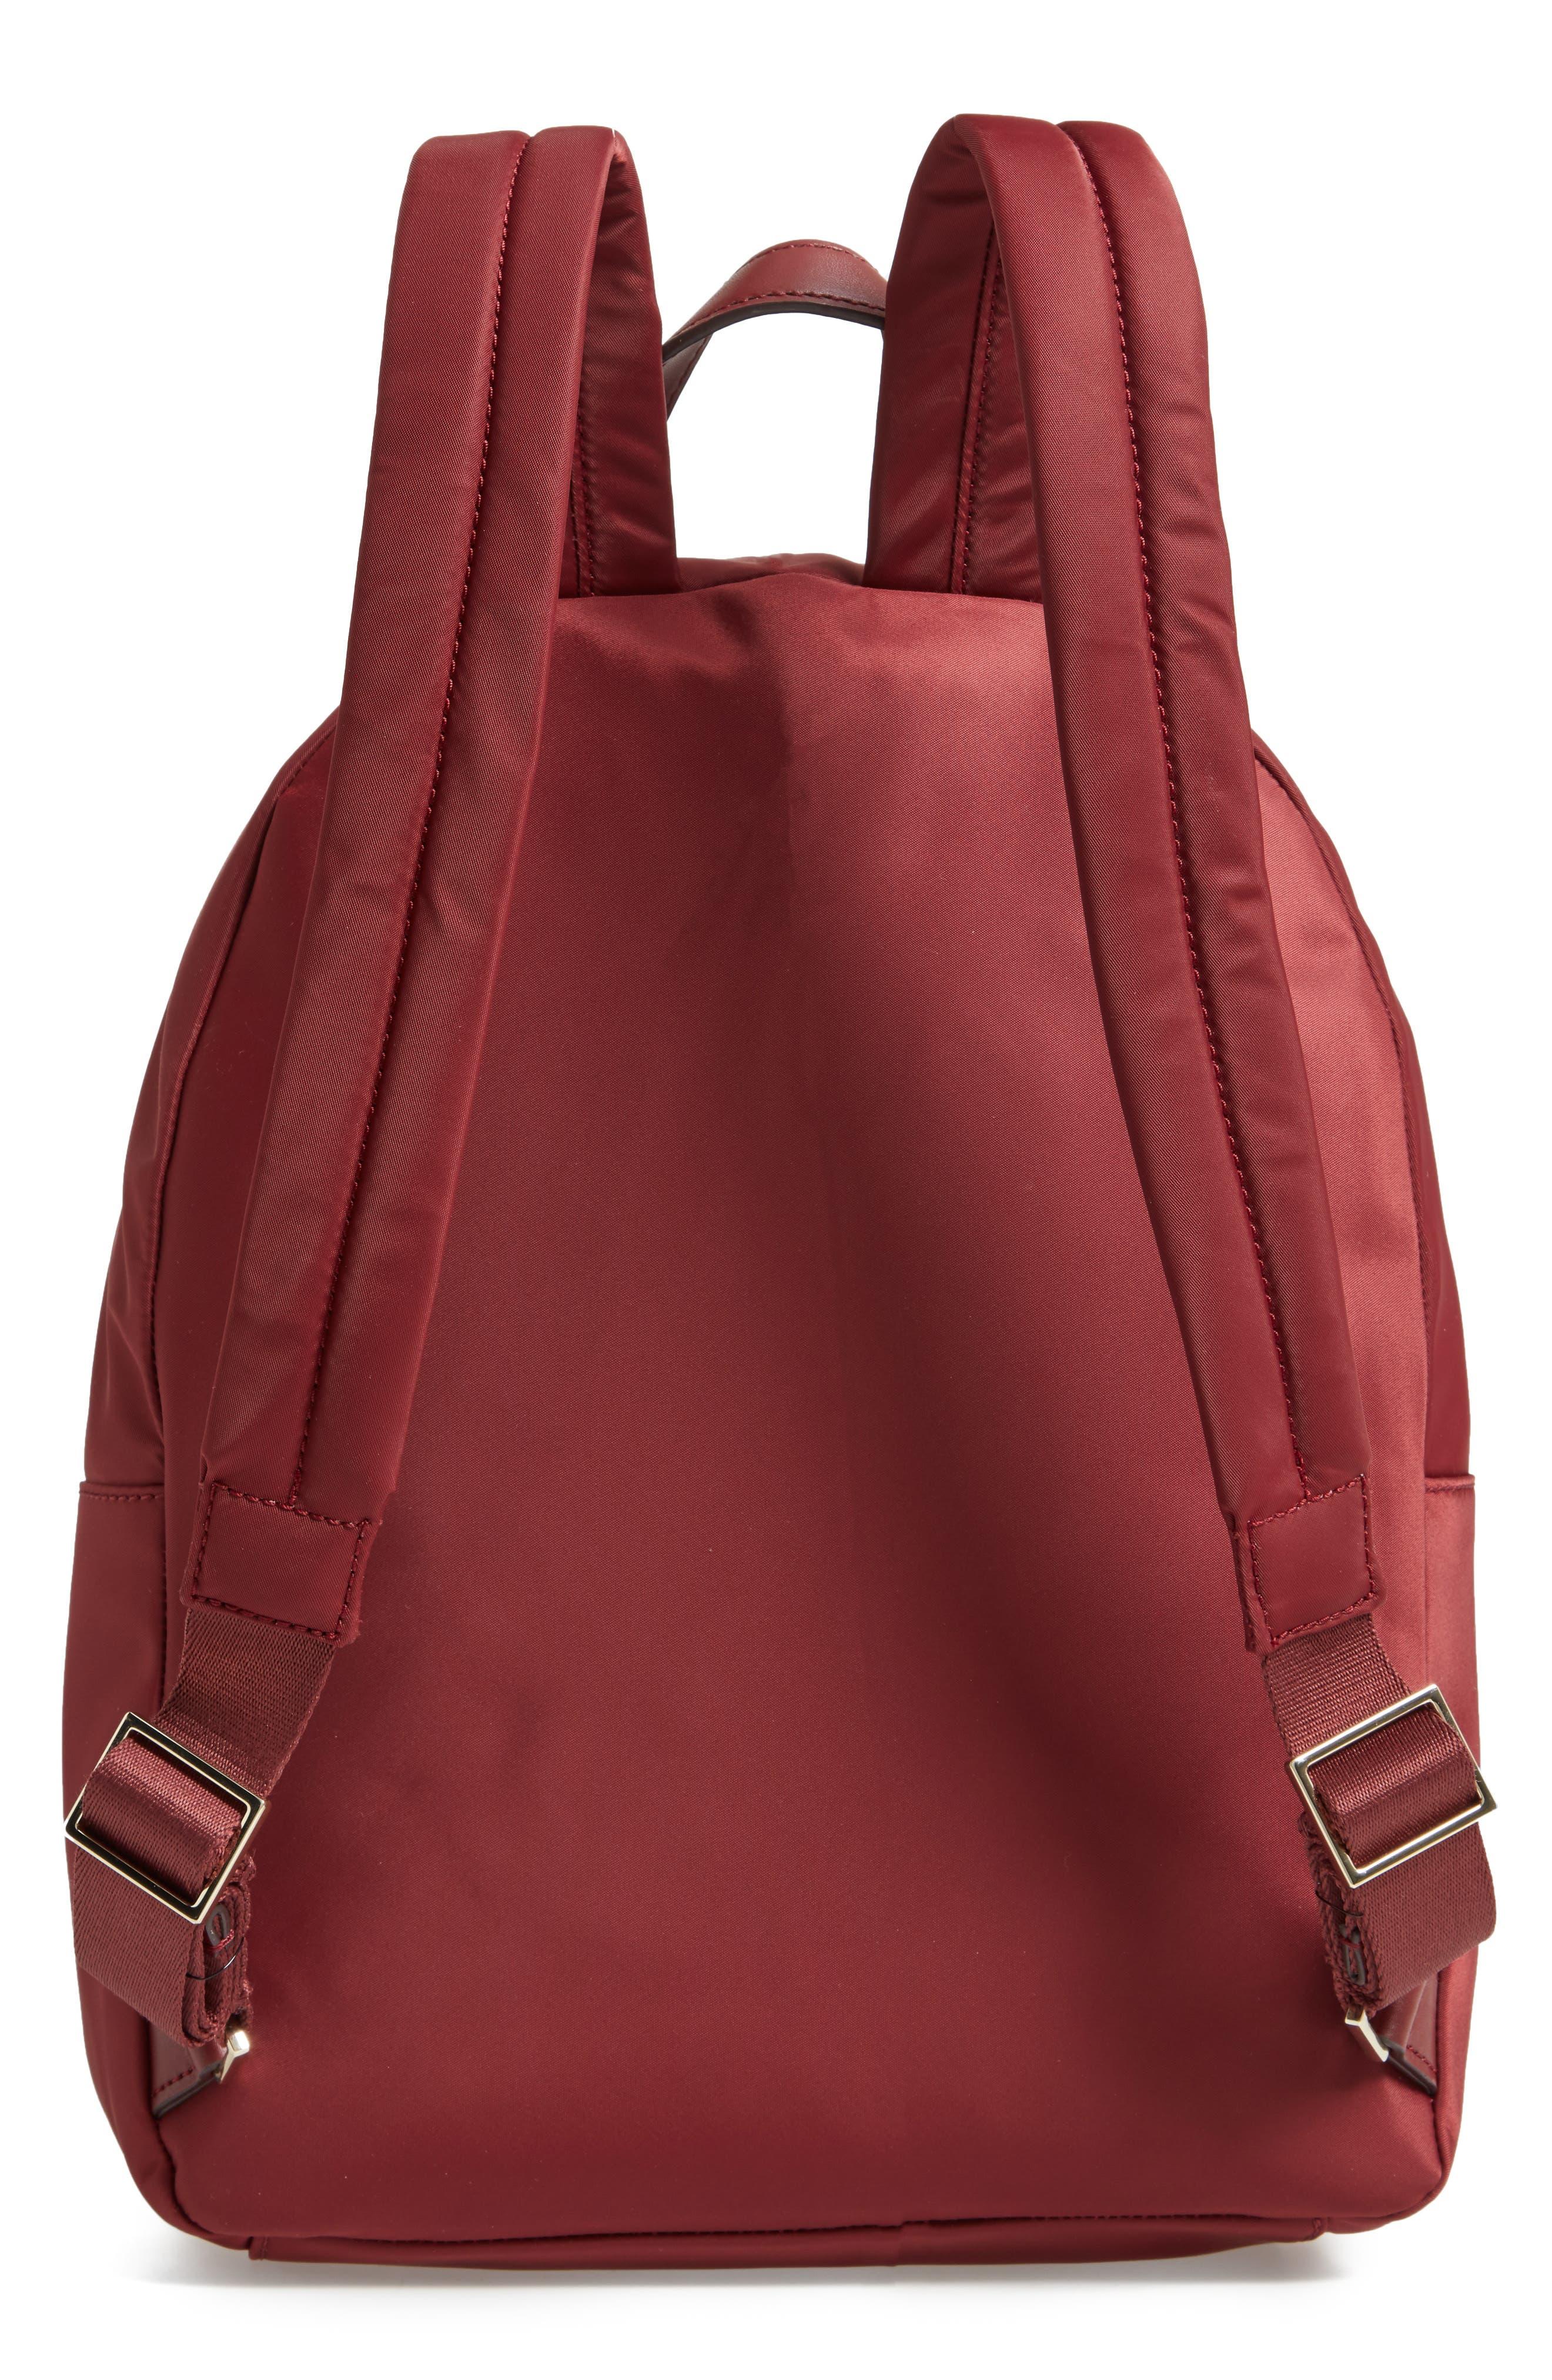 watson lane - hartley nylon backpack,                             Alternate thumbnail 3, color,                             DARK CURRANT